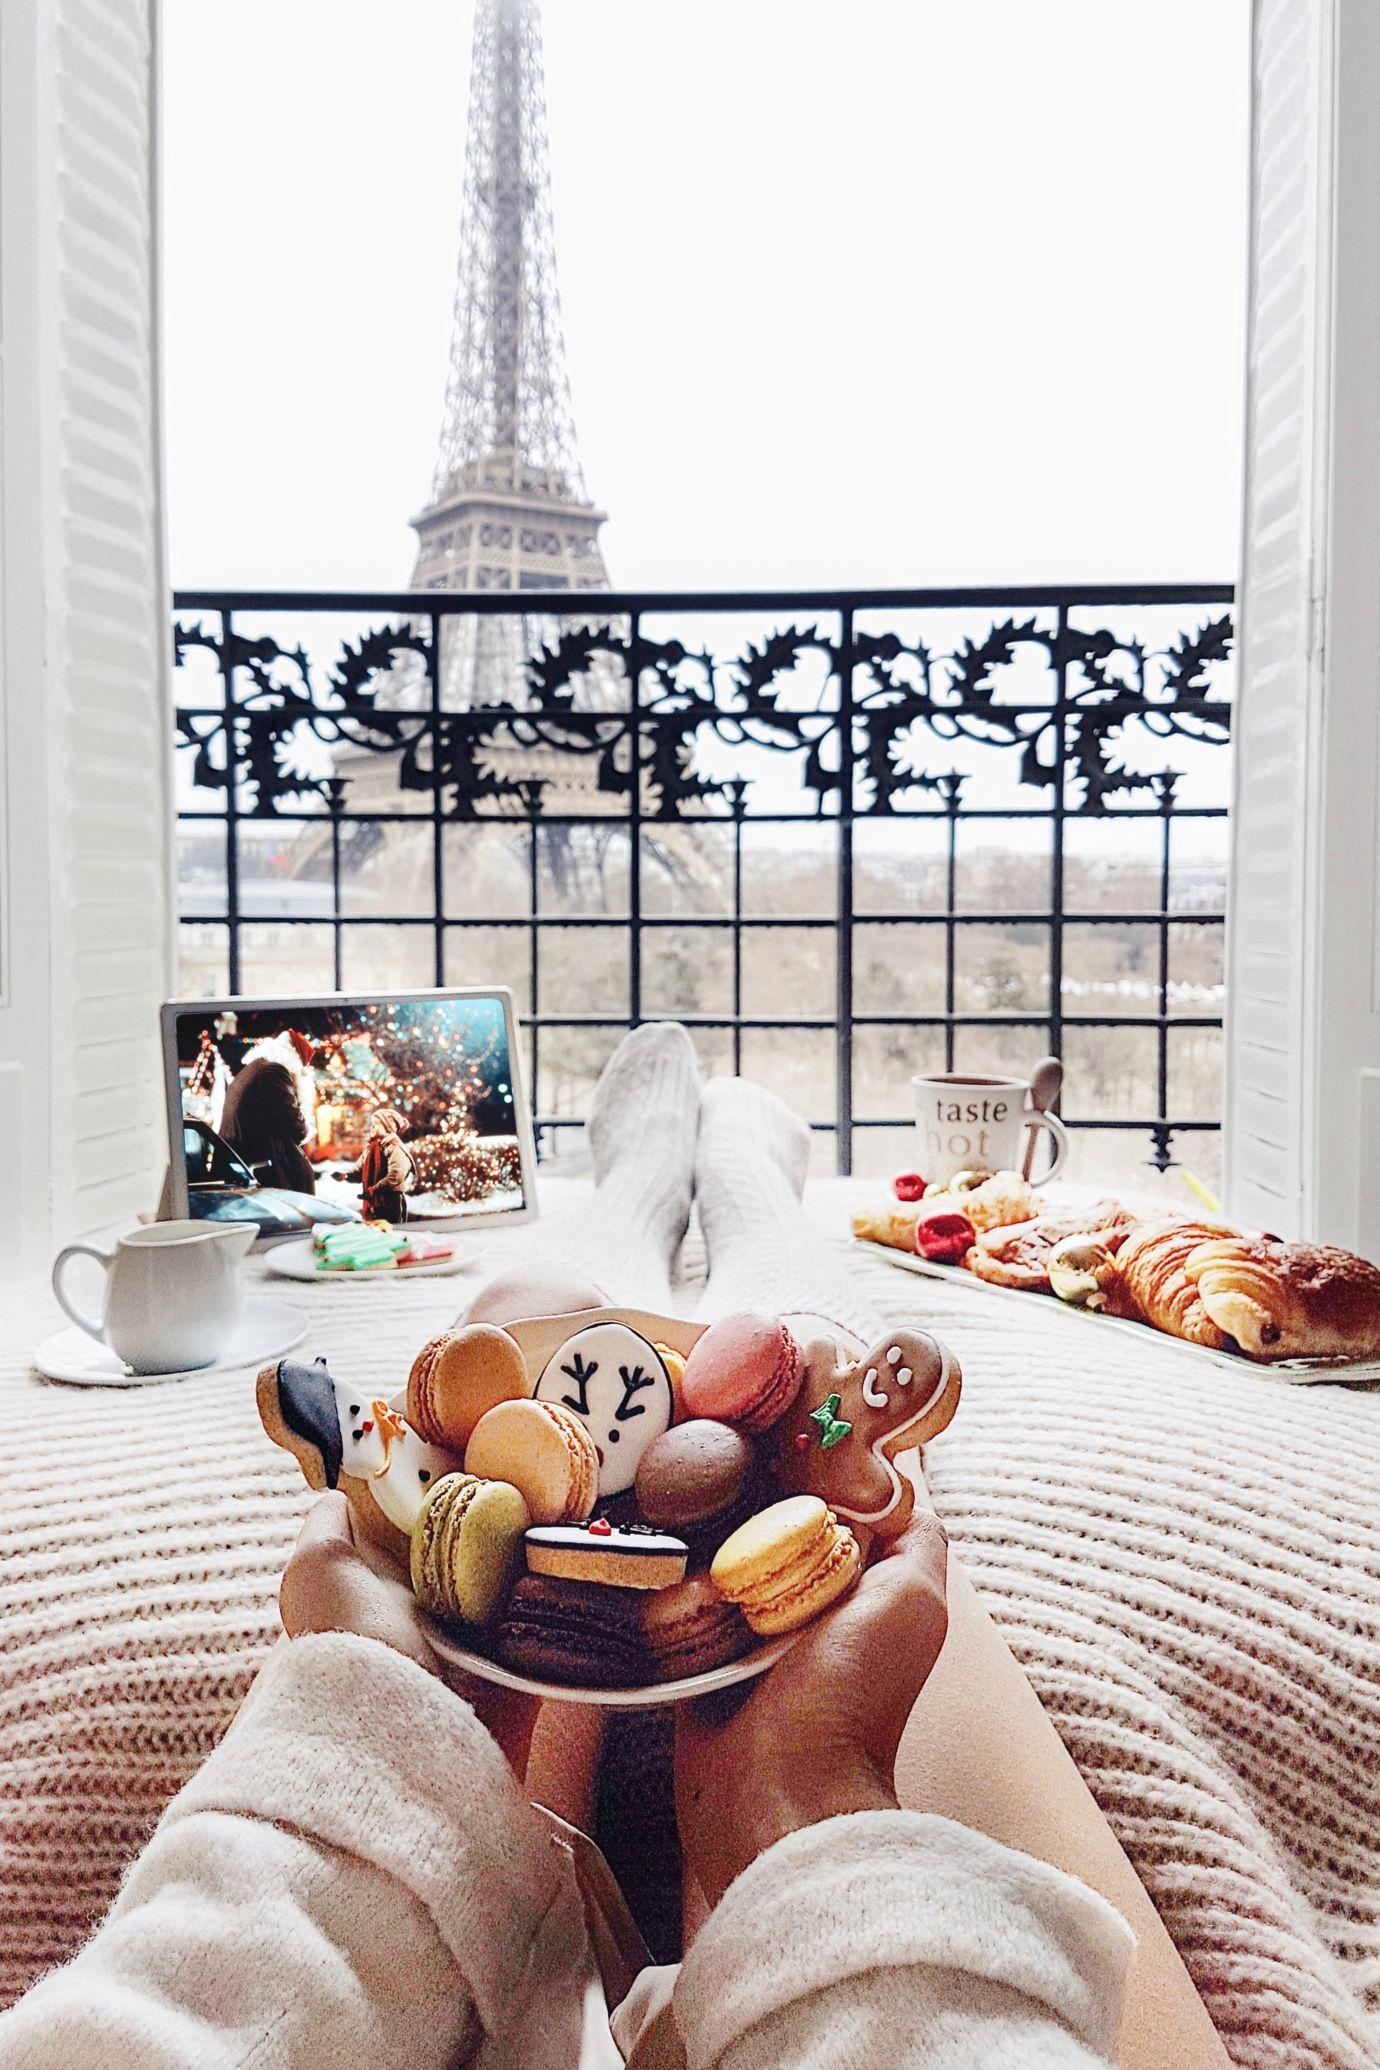 Christmas Break Christmas morning, Paris hotels and